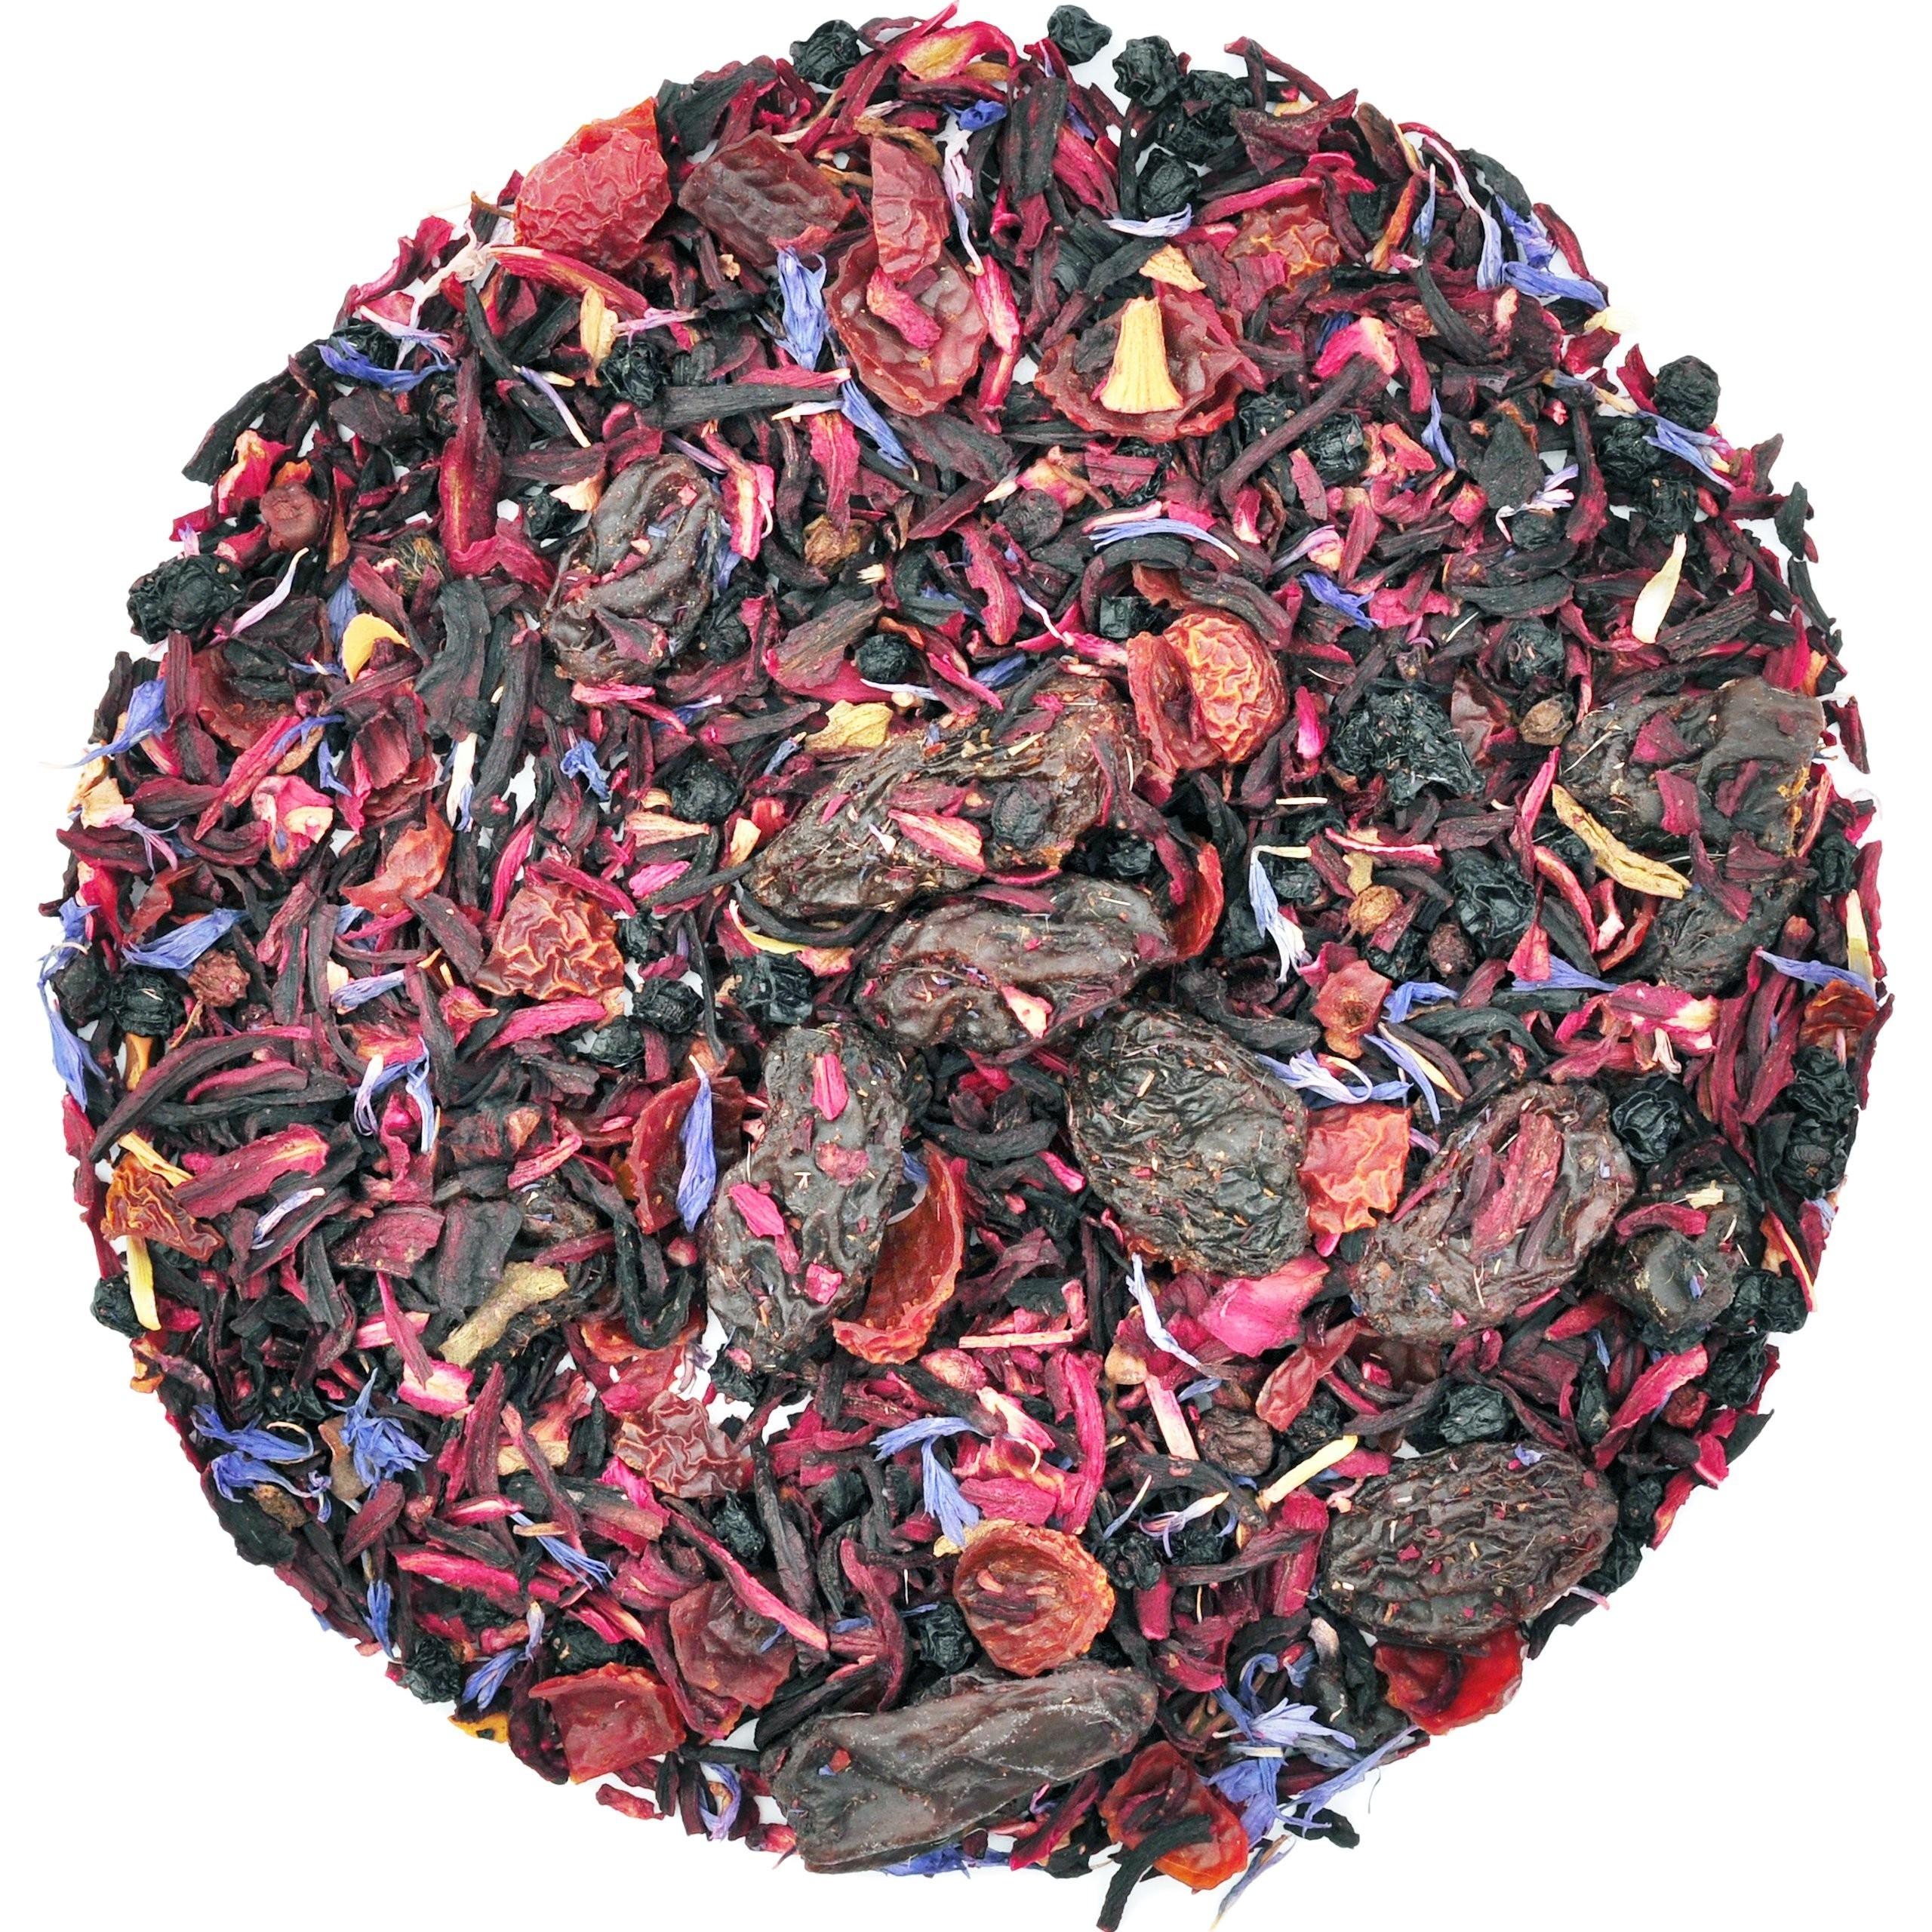 RAINBOW Fruit Tea 50g ОТЛИЧНО